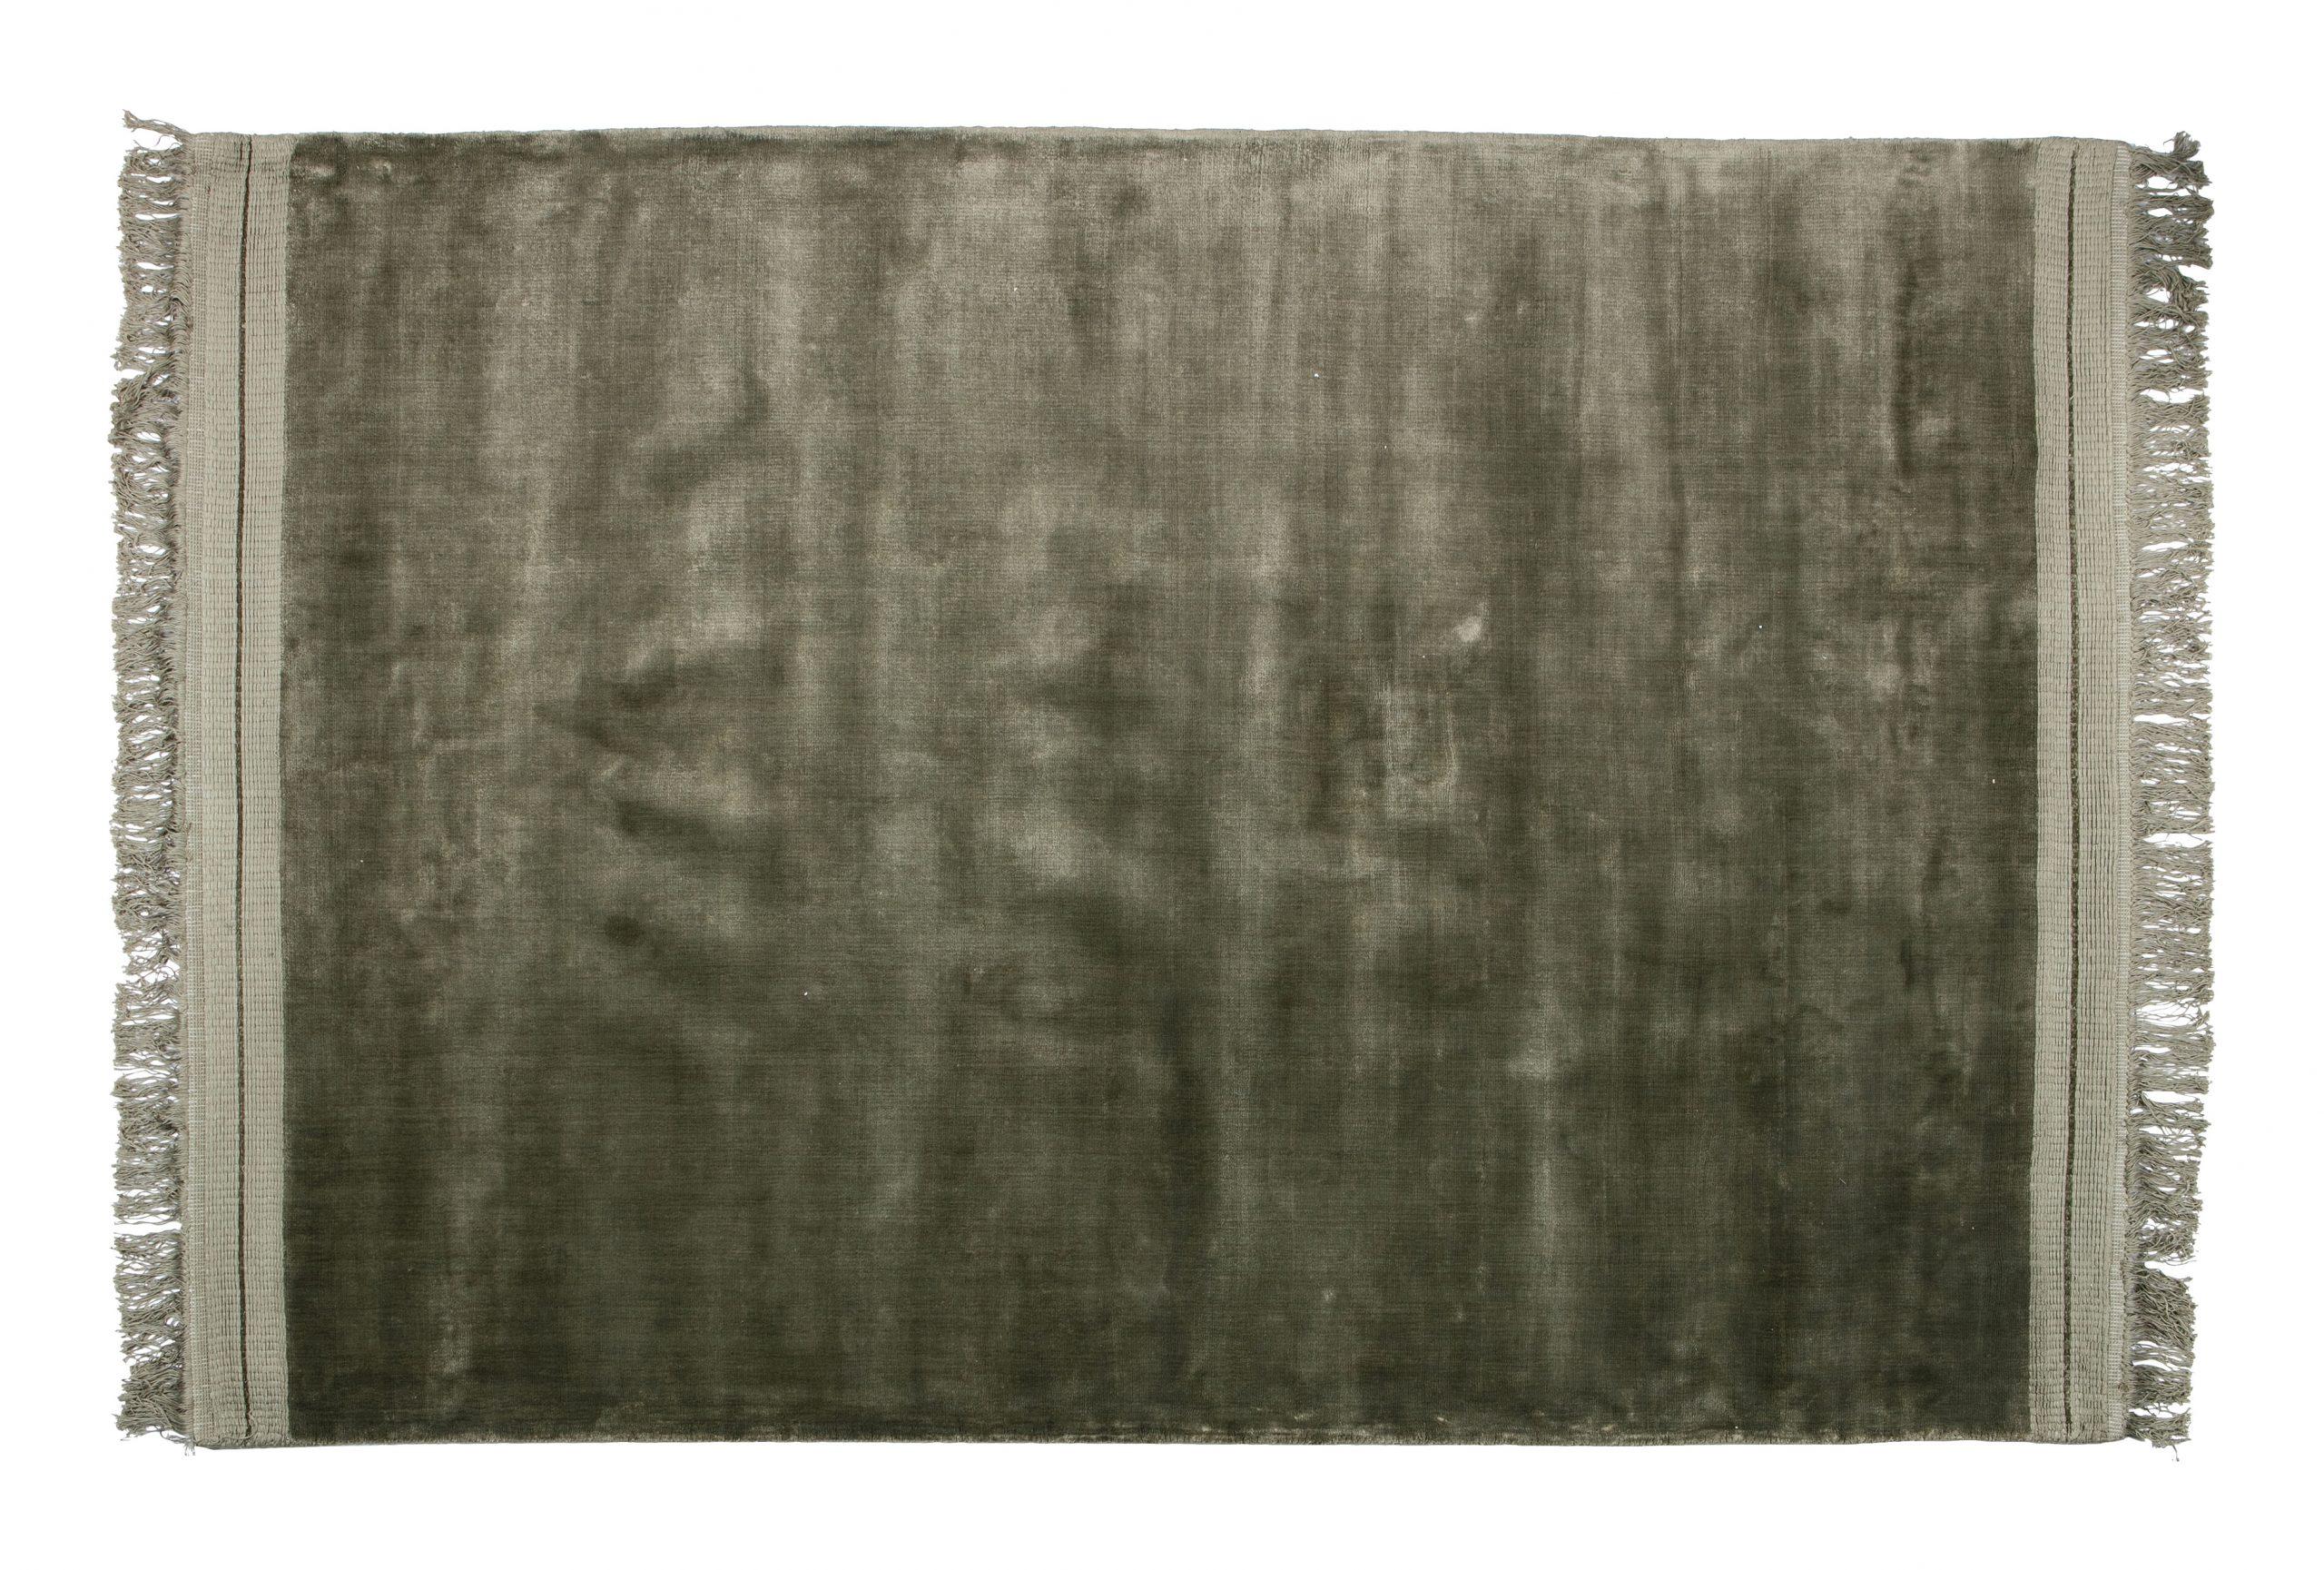 BePureHome Vloerkleed 'Ravel' 170 x 240cm, kleur groen | BePureHome